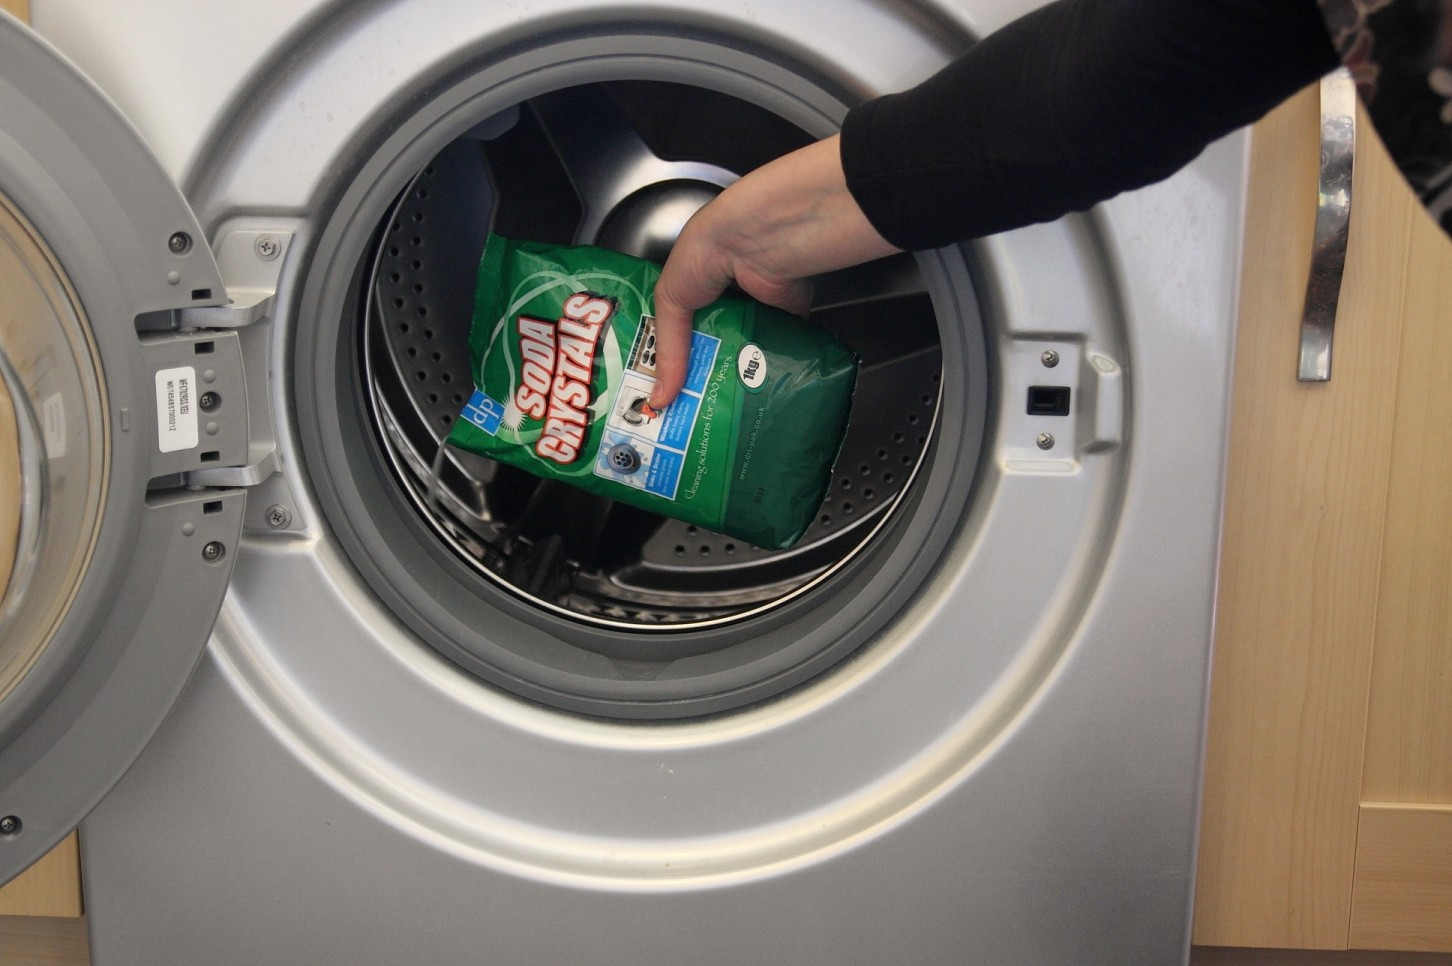 igienizzare la lavatrice